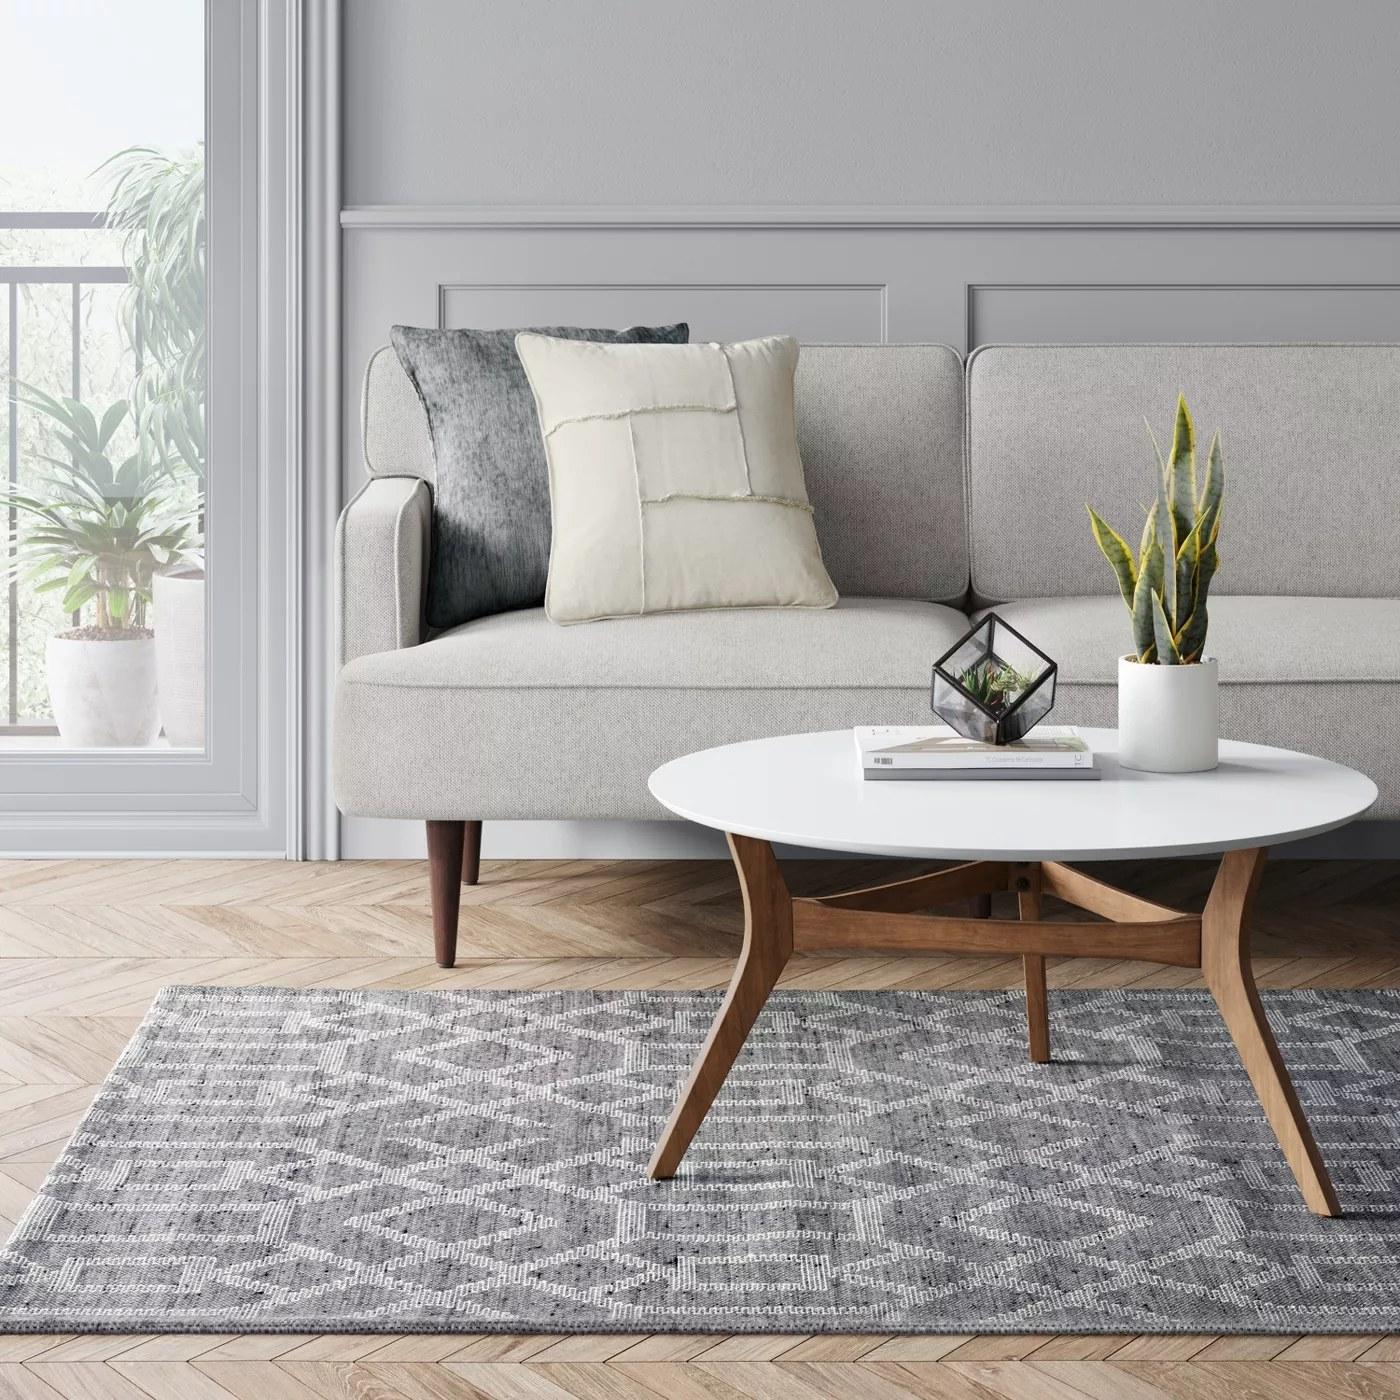 A gray geometric rug